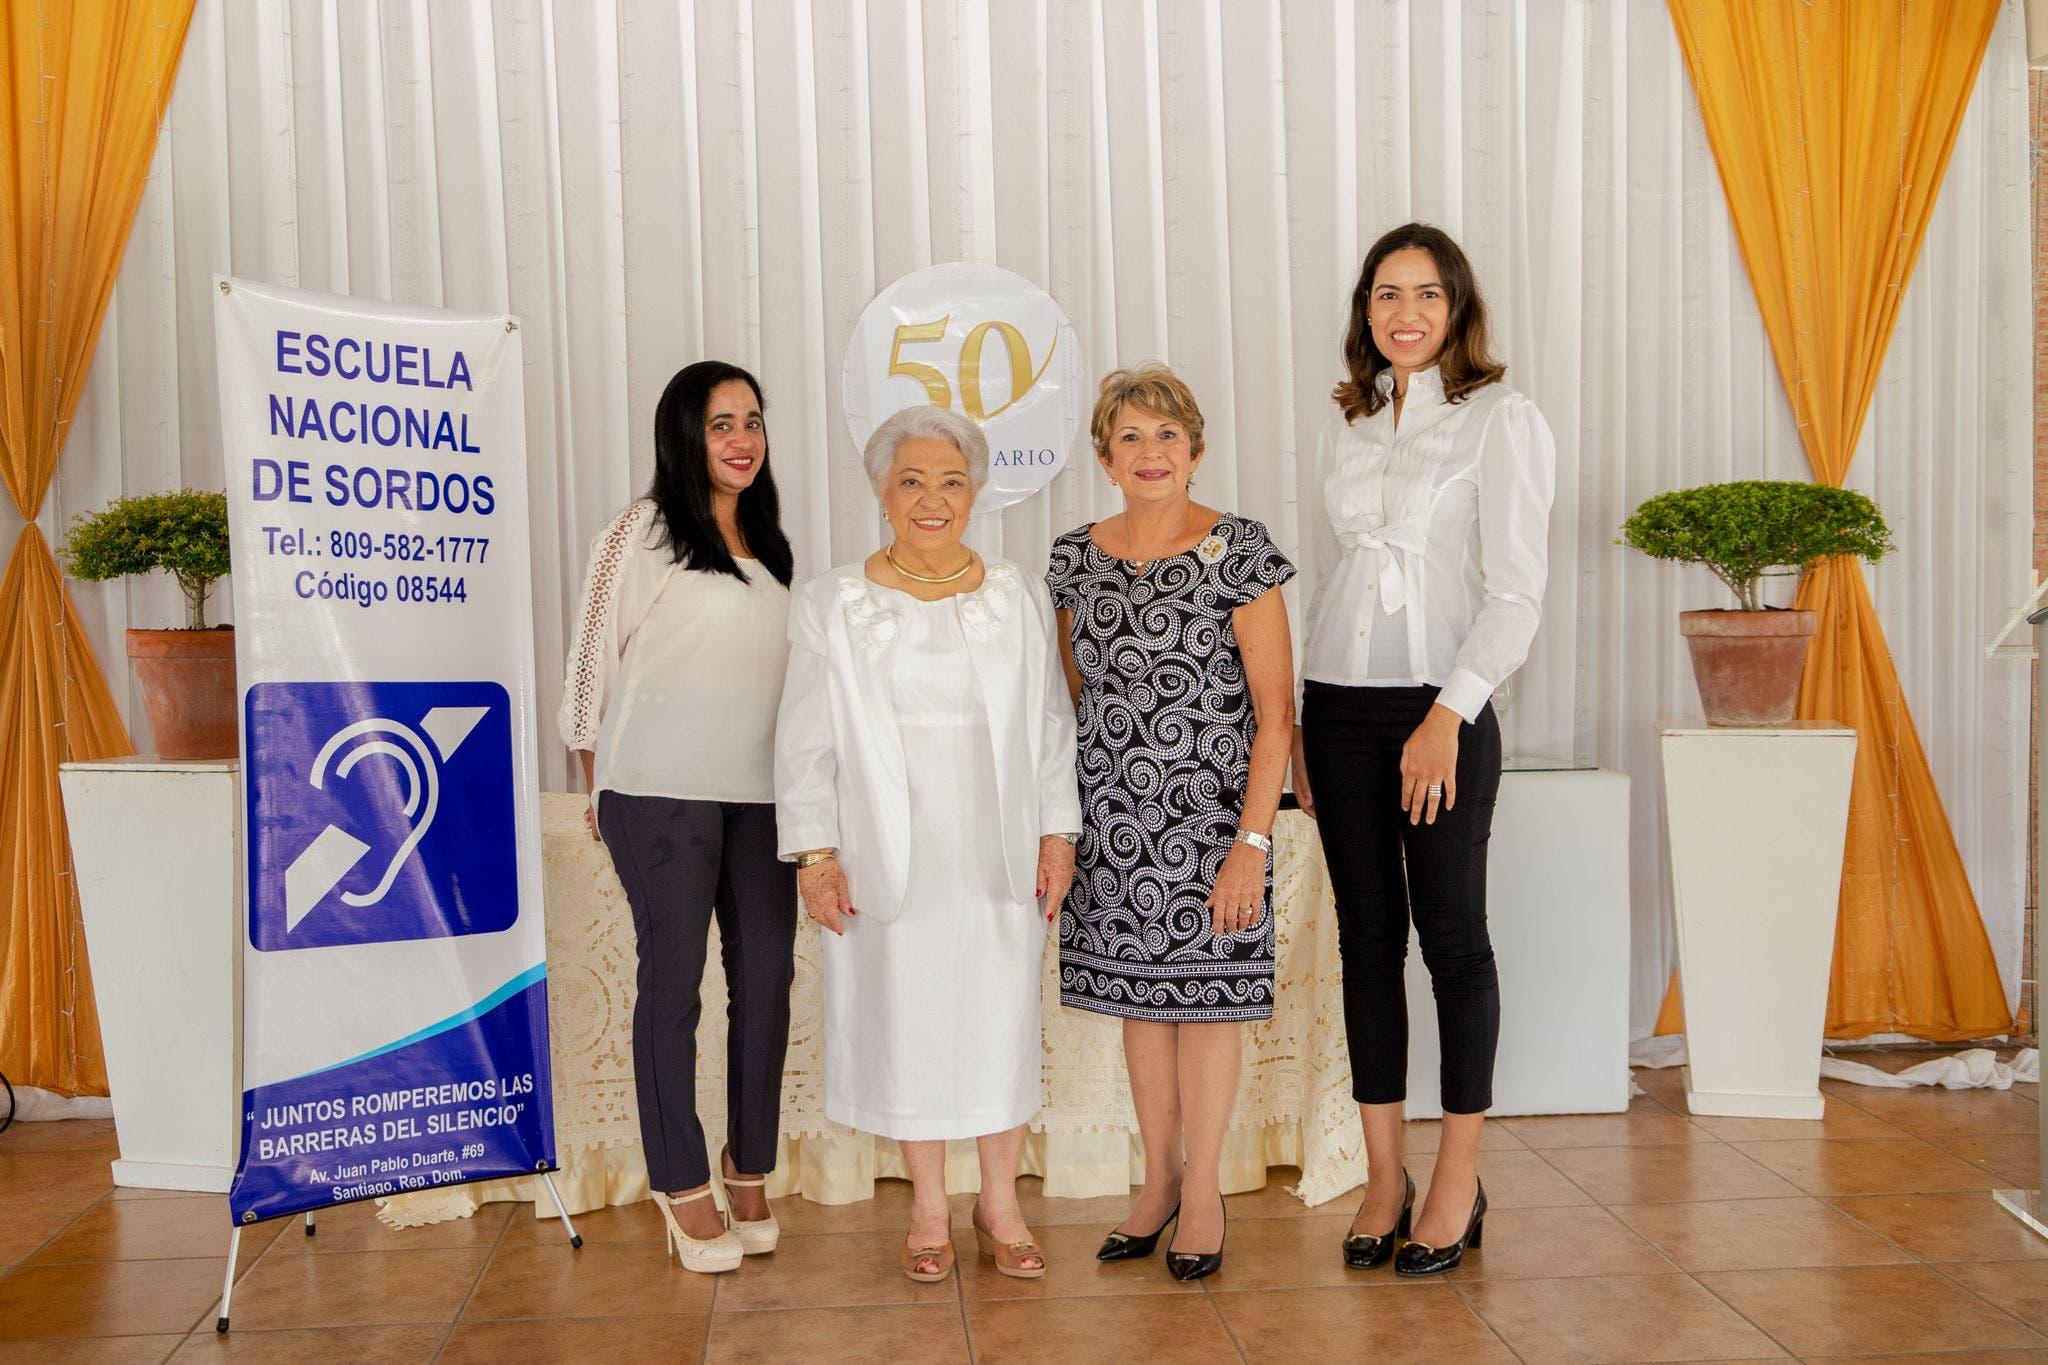 Escuela Nacional para Sordos deSantiago celebra 50 Aniversario